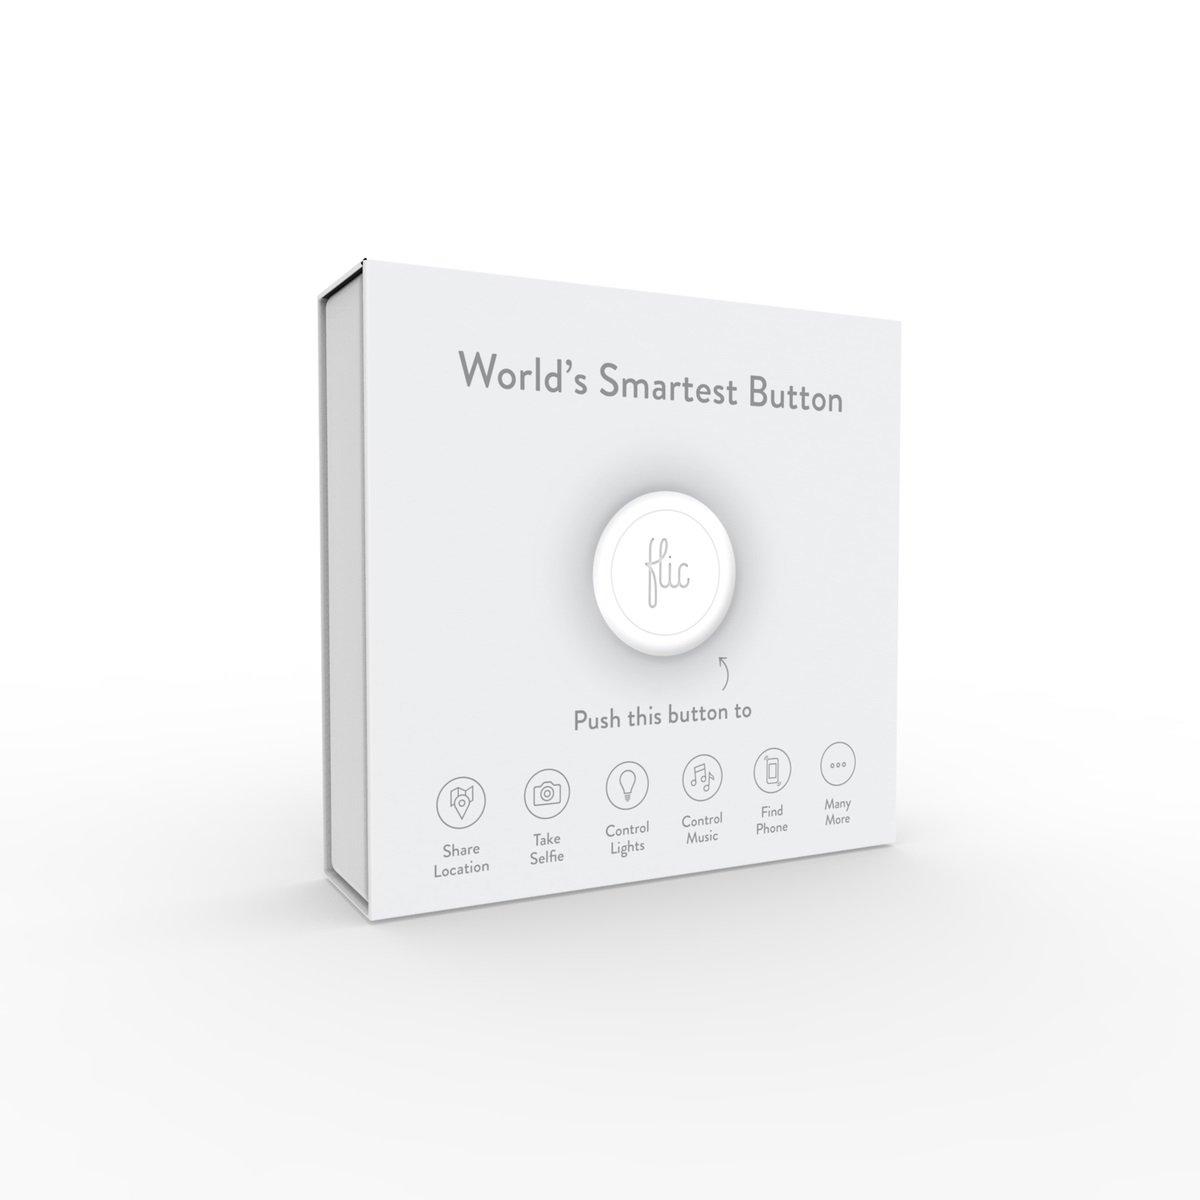 Black Flic RTLF006 The Wireless Smart Button